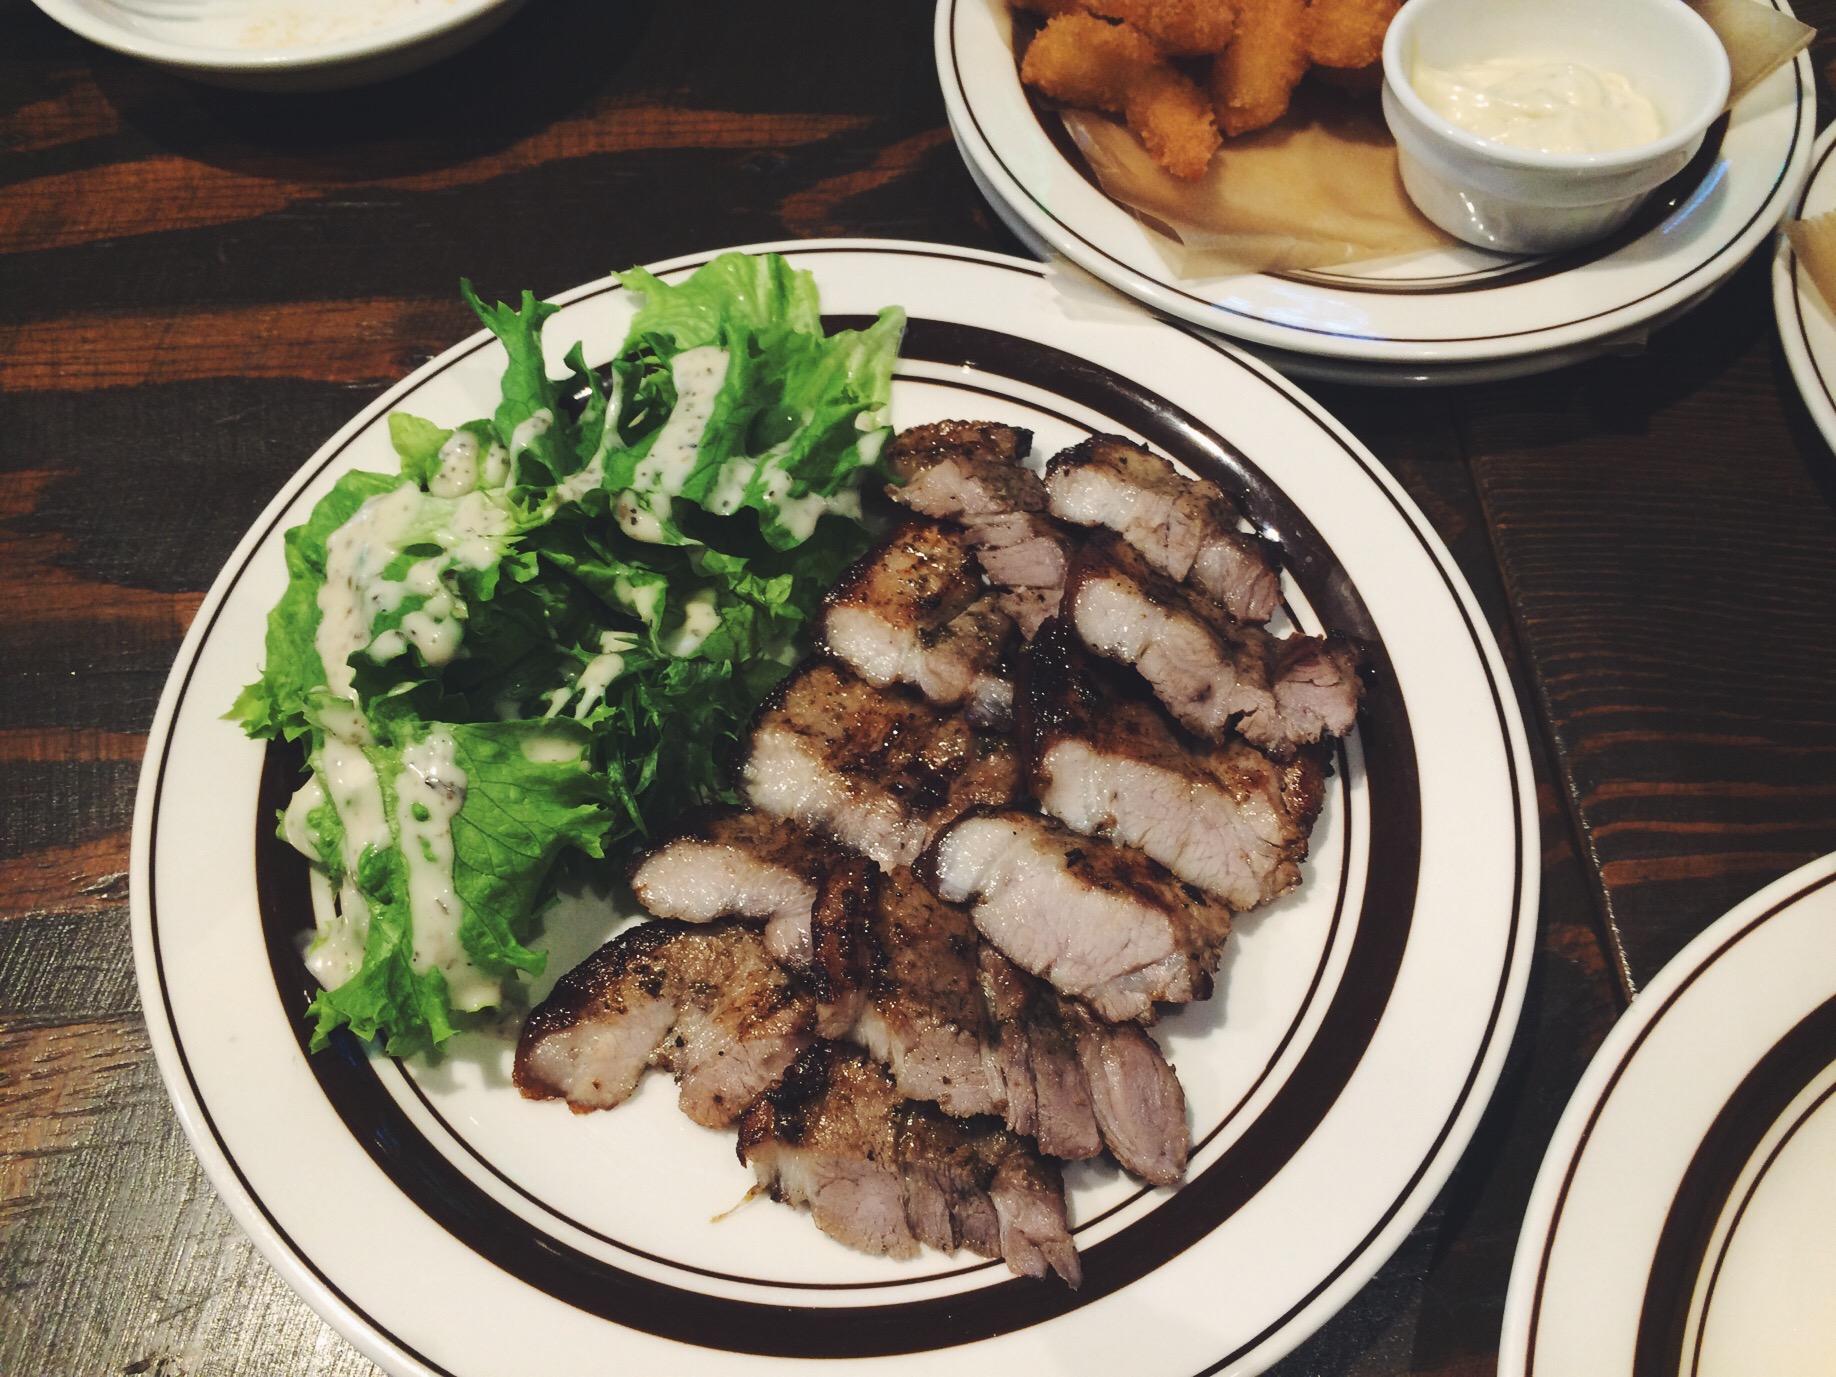 I think this was the pork belly, soooo tasty!